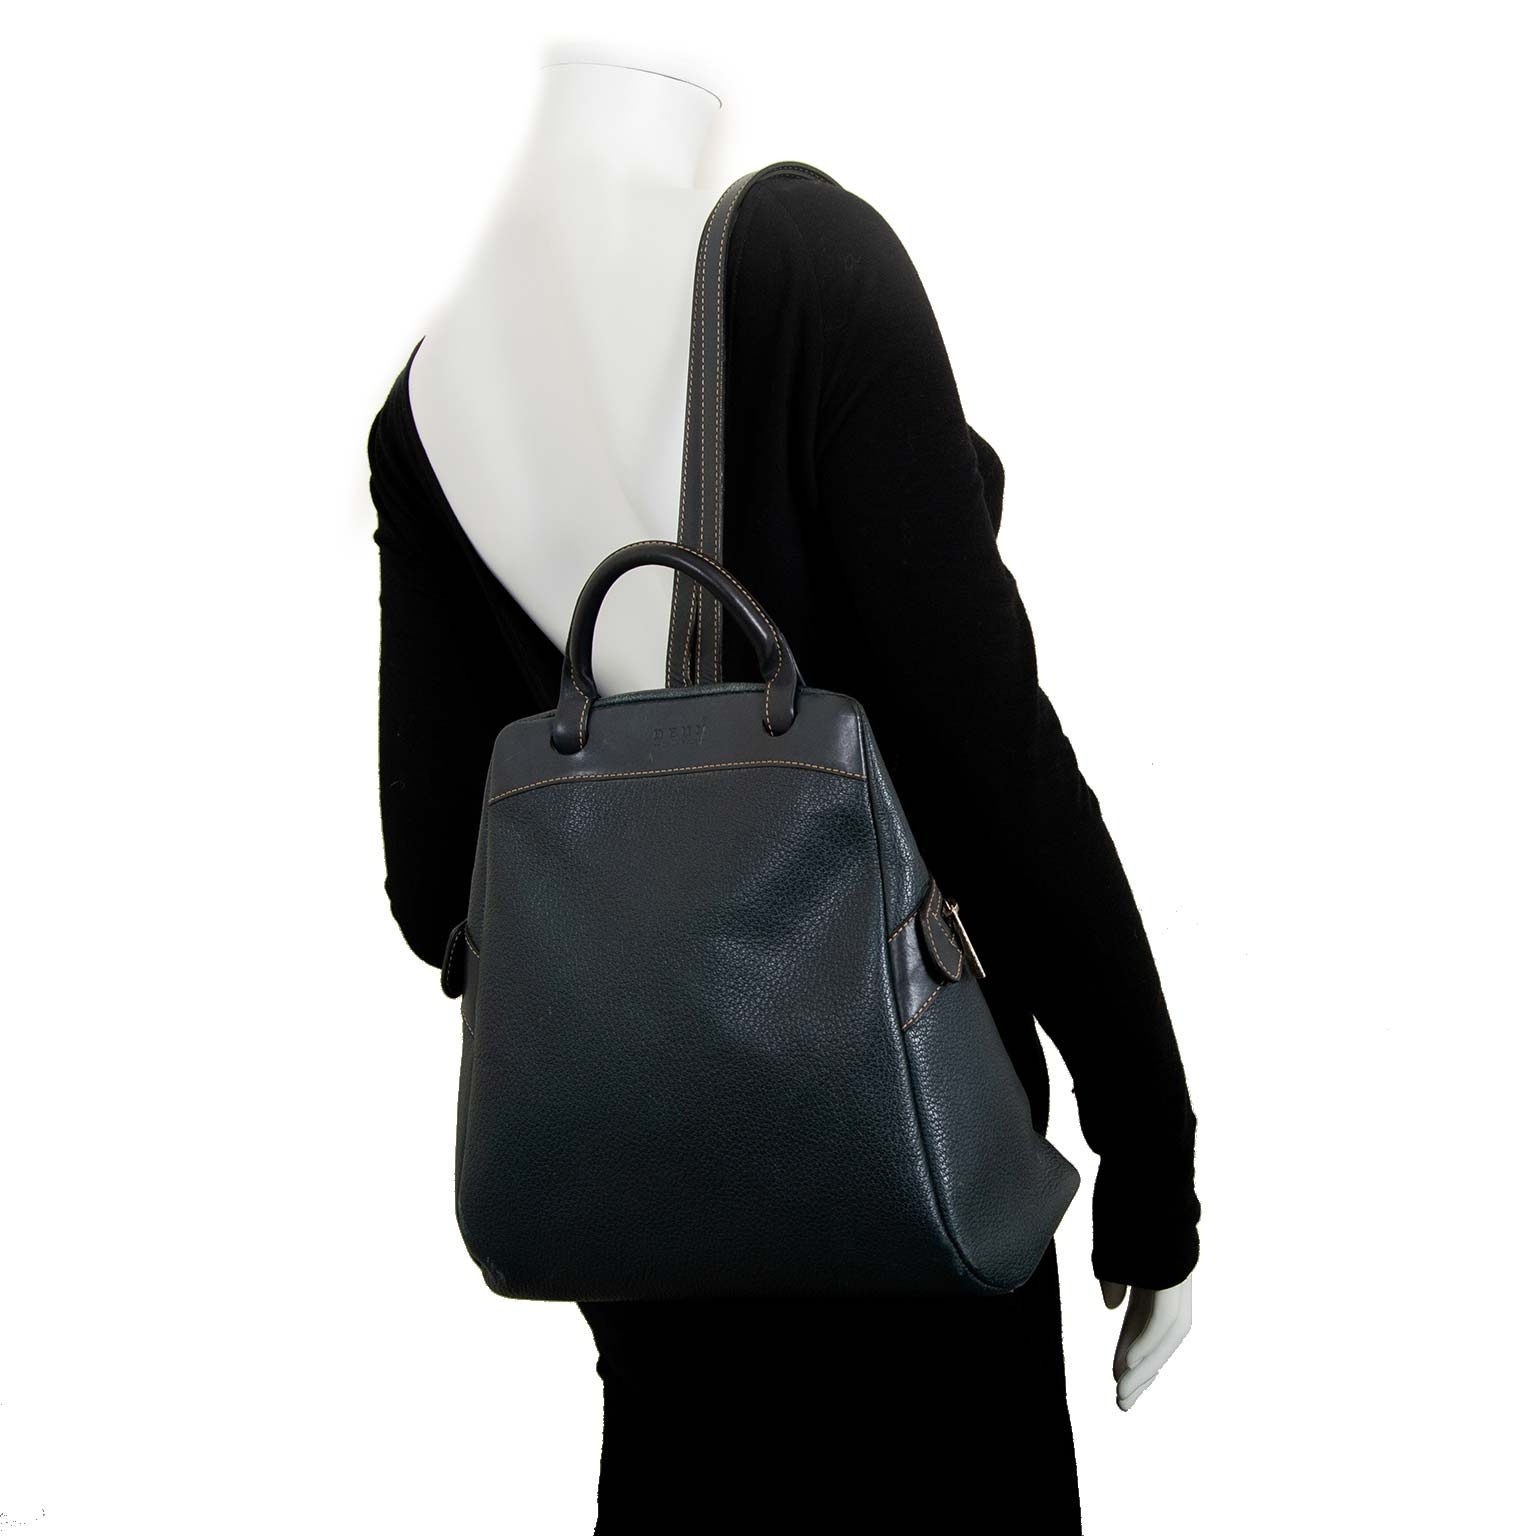 delvaux deux de delvaux donker blauw lederen rugzak nu te koop bij labellov vintage mode webshop belgië